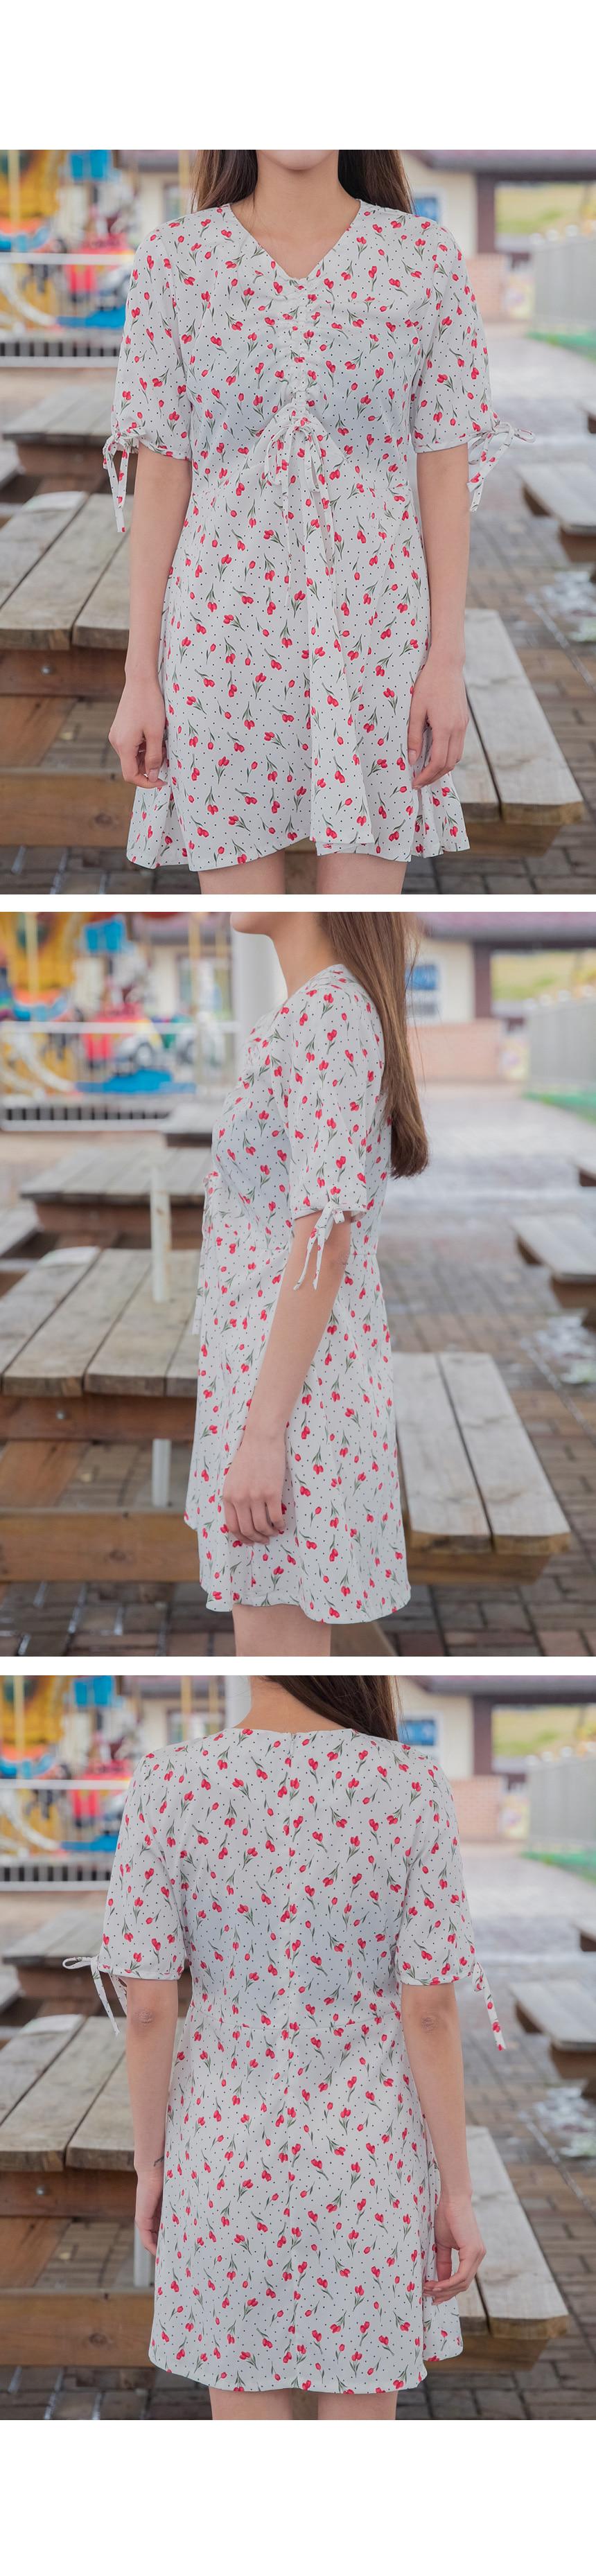 String Tulip Dress